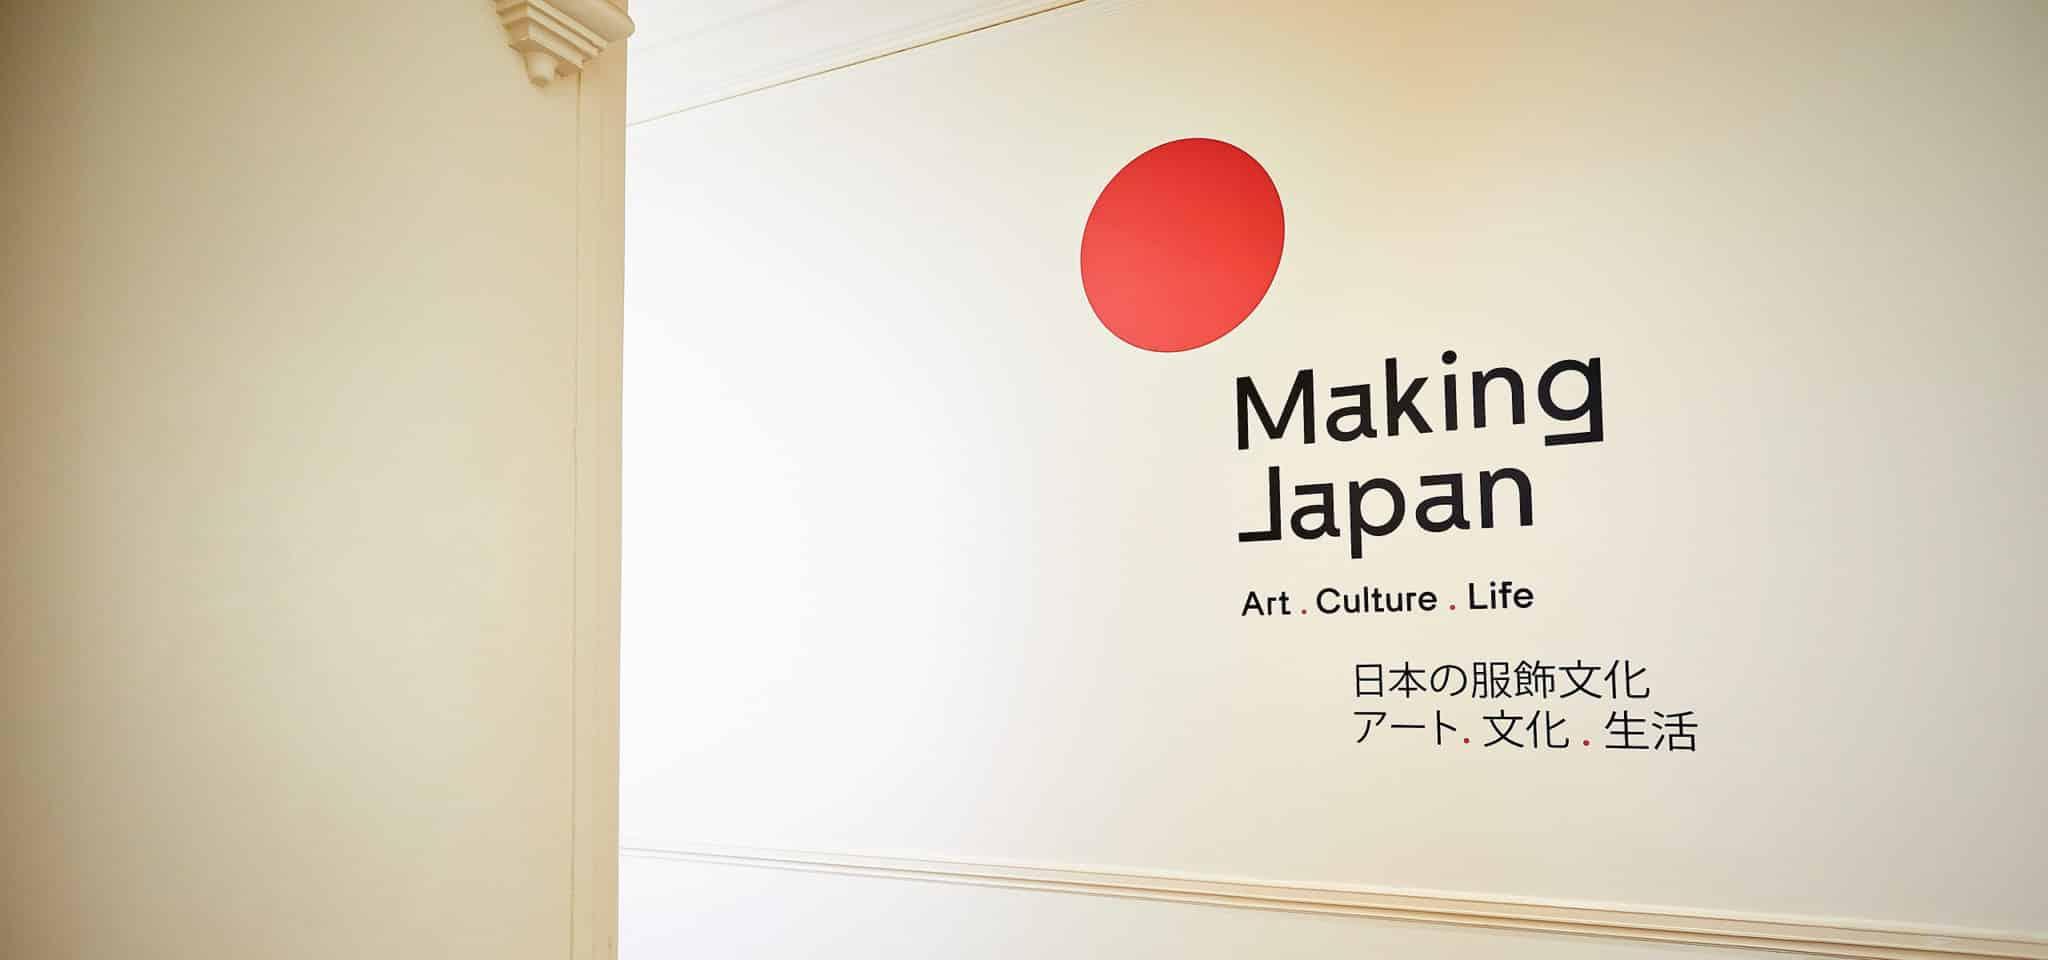 Making Japan Exhibition Branding, Logo Design, Vinyl Cut Wall Graphic